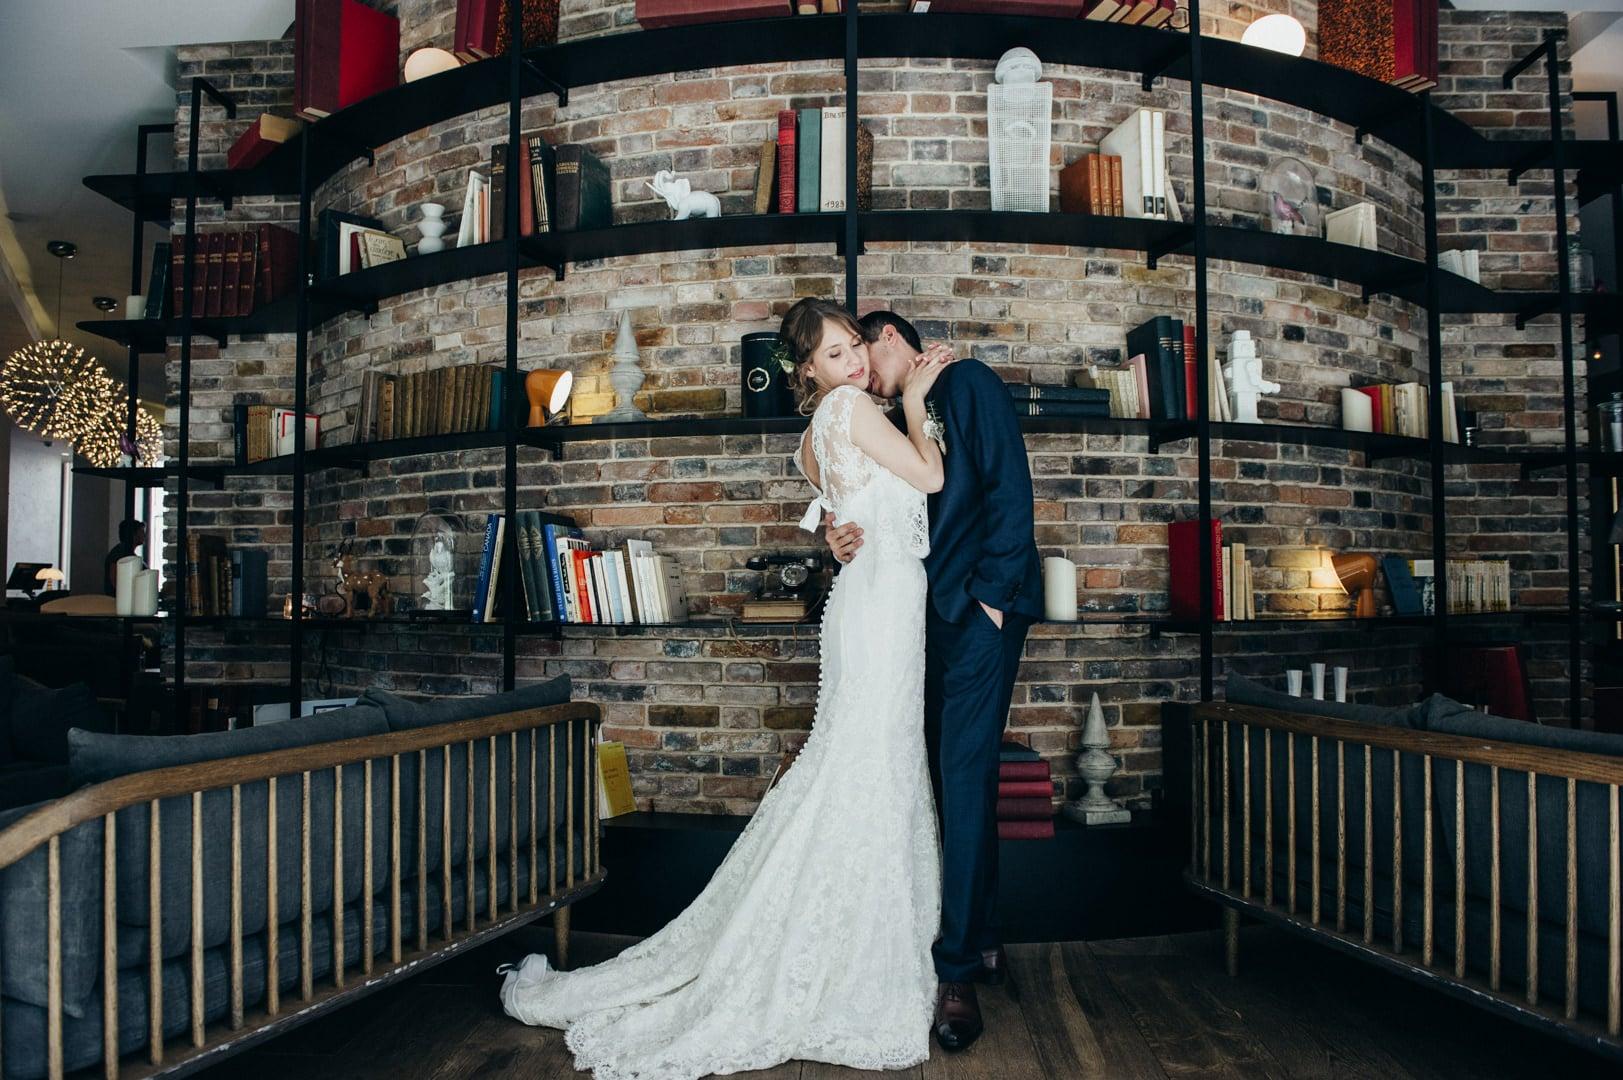 stephane leludec photographe mariage rennes nantes bretagne. Black Bedroom Furniture Sets. Home Design Ideas